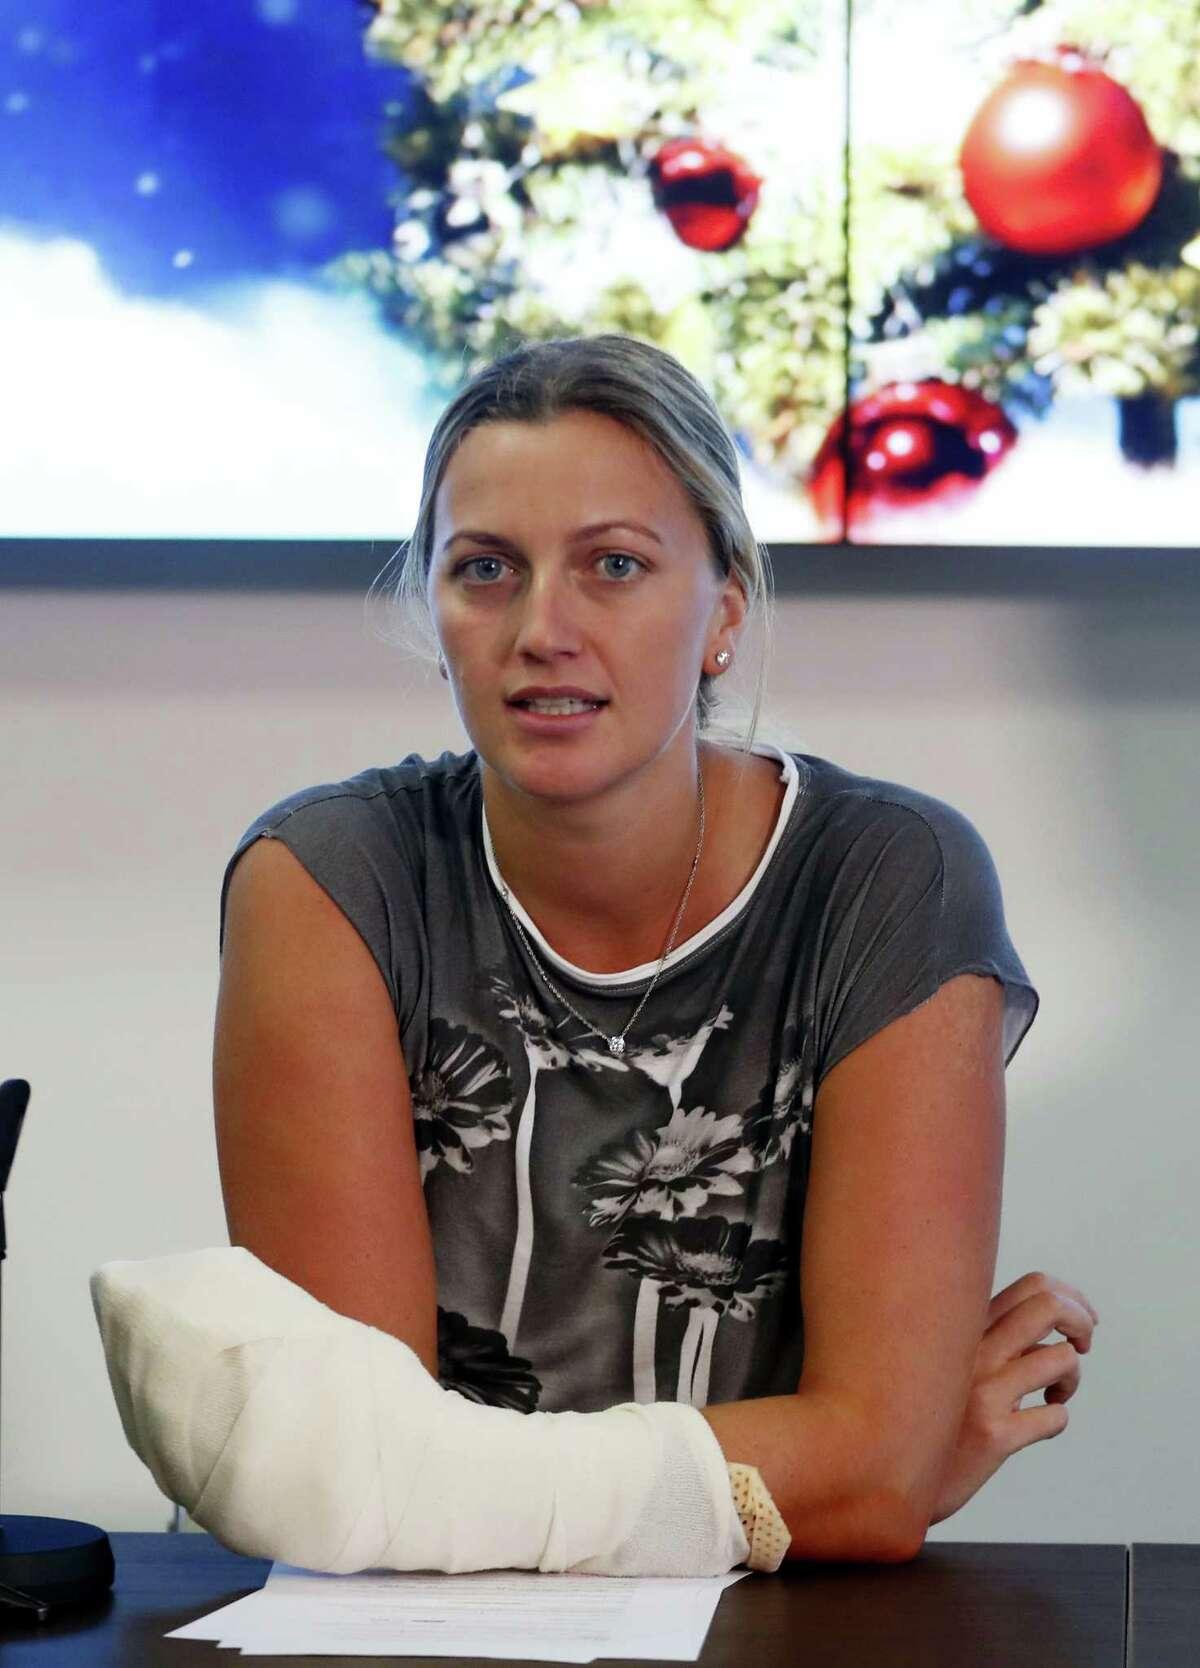 Petra Kvitova met with the media in Prague, Czech Republic, on Friday.